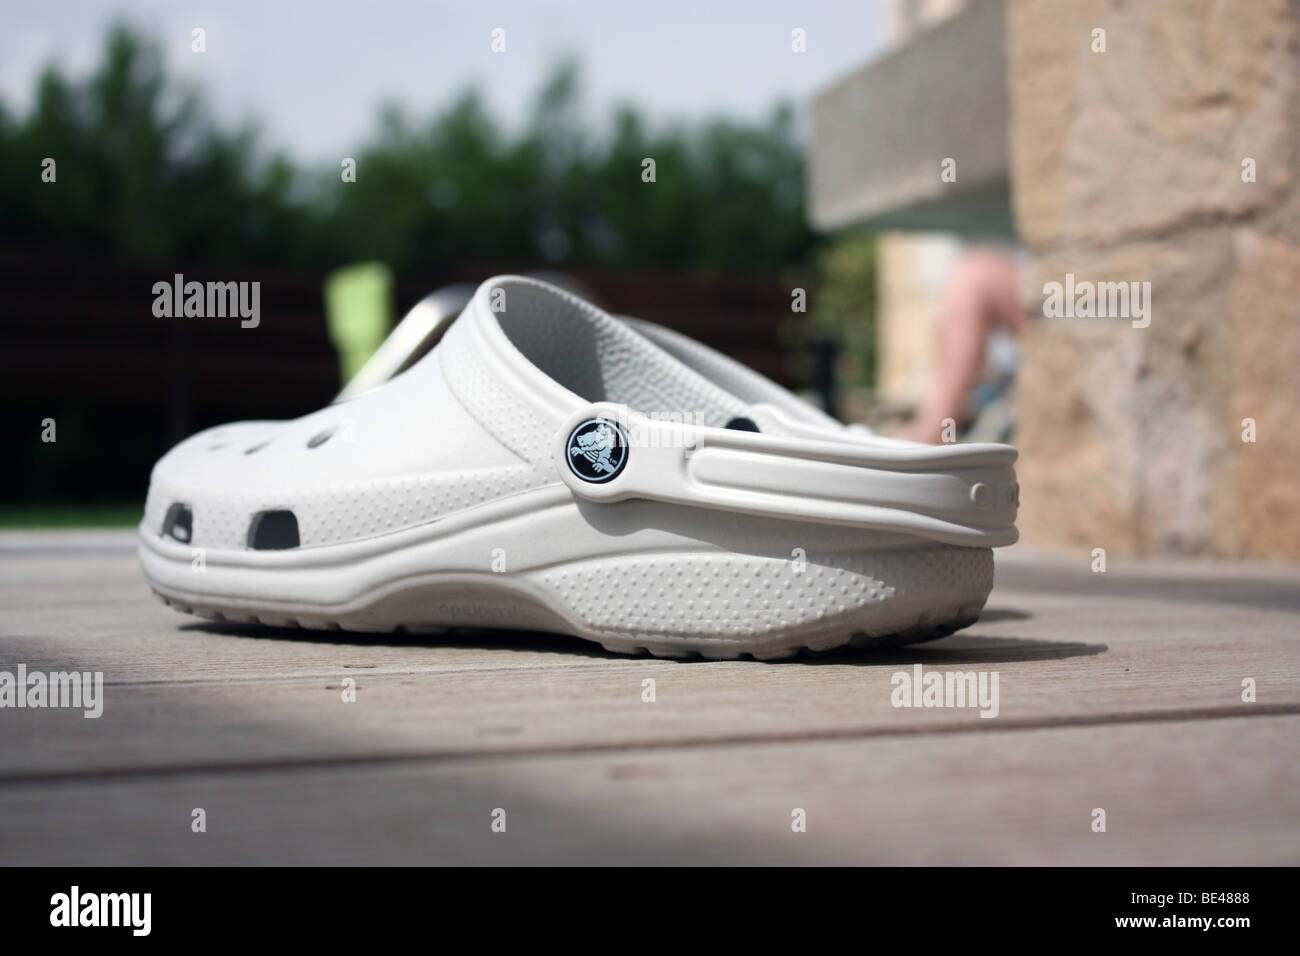 A pair of Crocs footwear - Stock Image